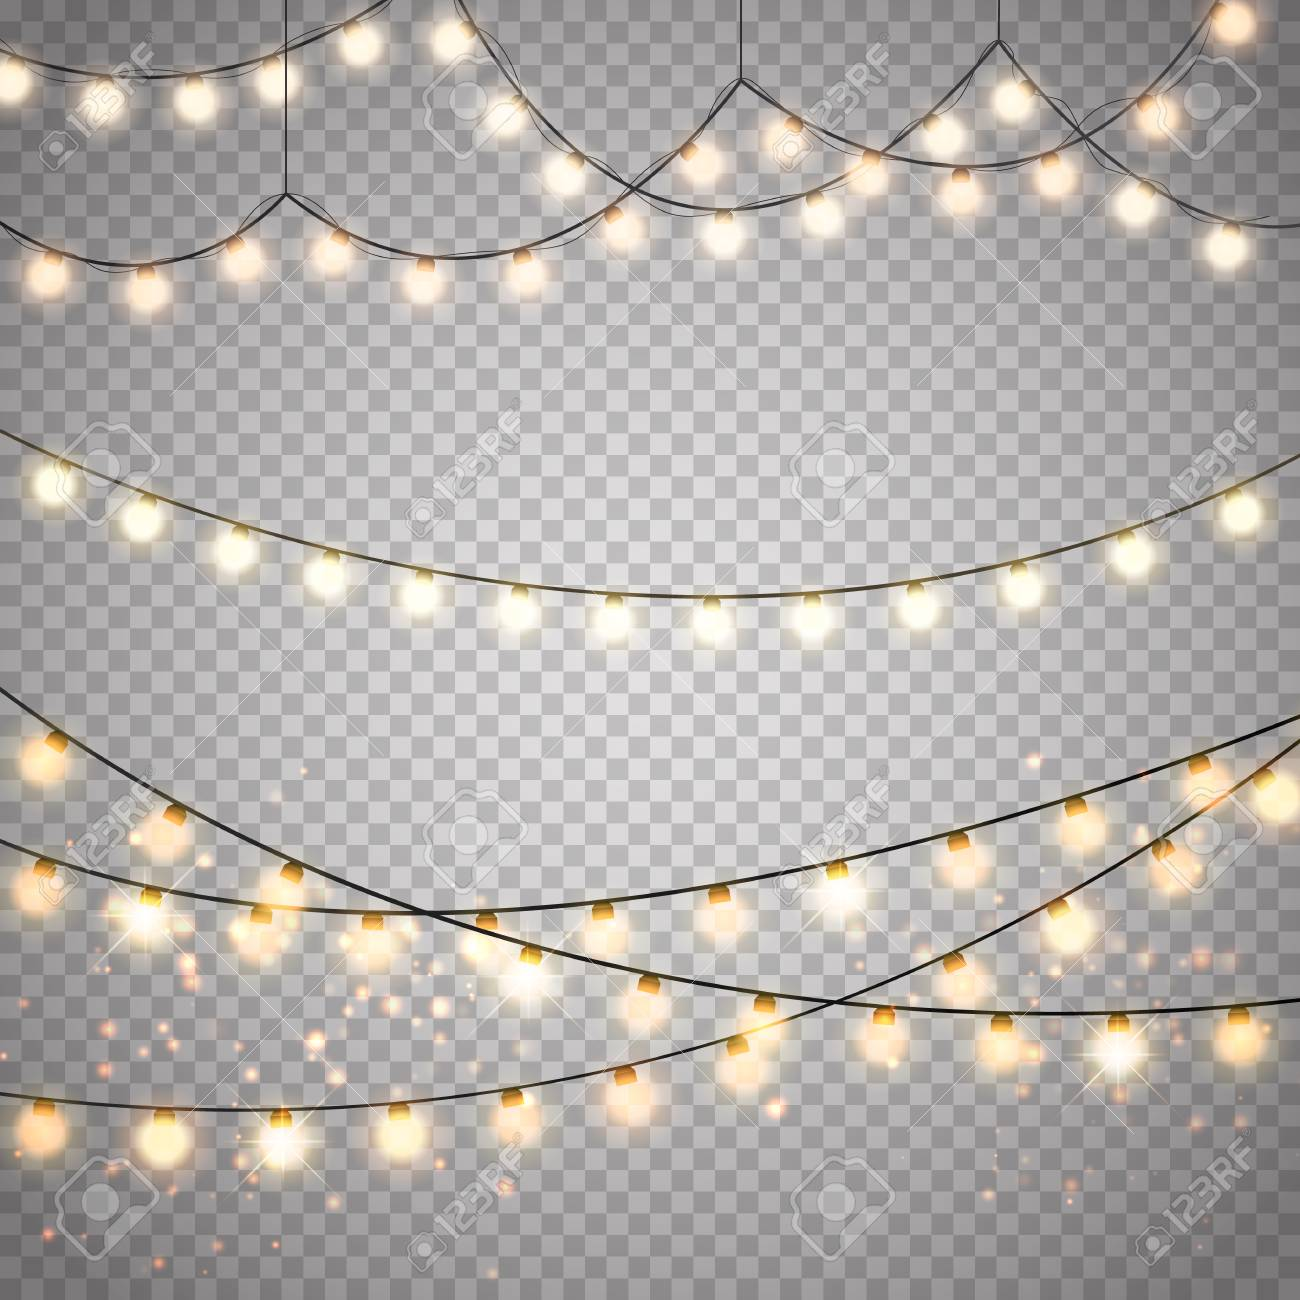 Christmas Lights Transparent Background.Christmas Lights Isolated On Transparent Background Vector Xmas